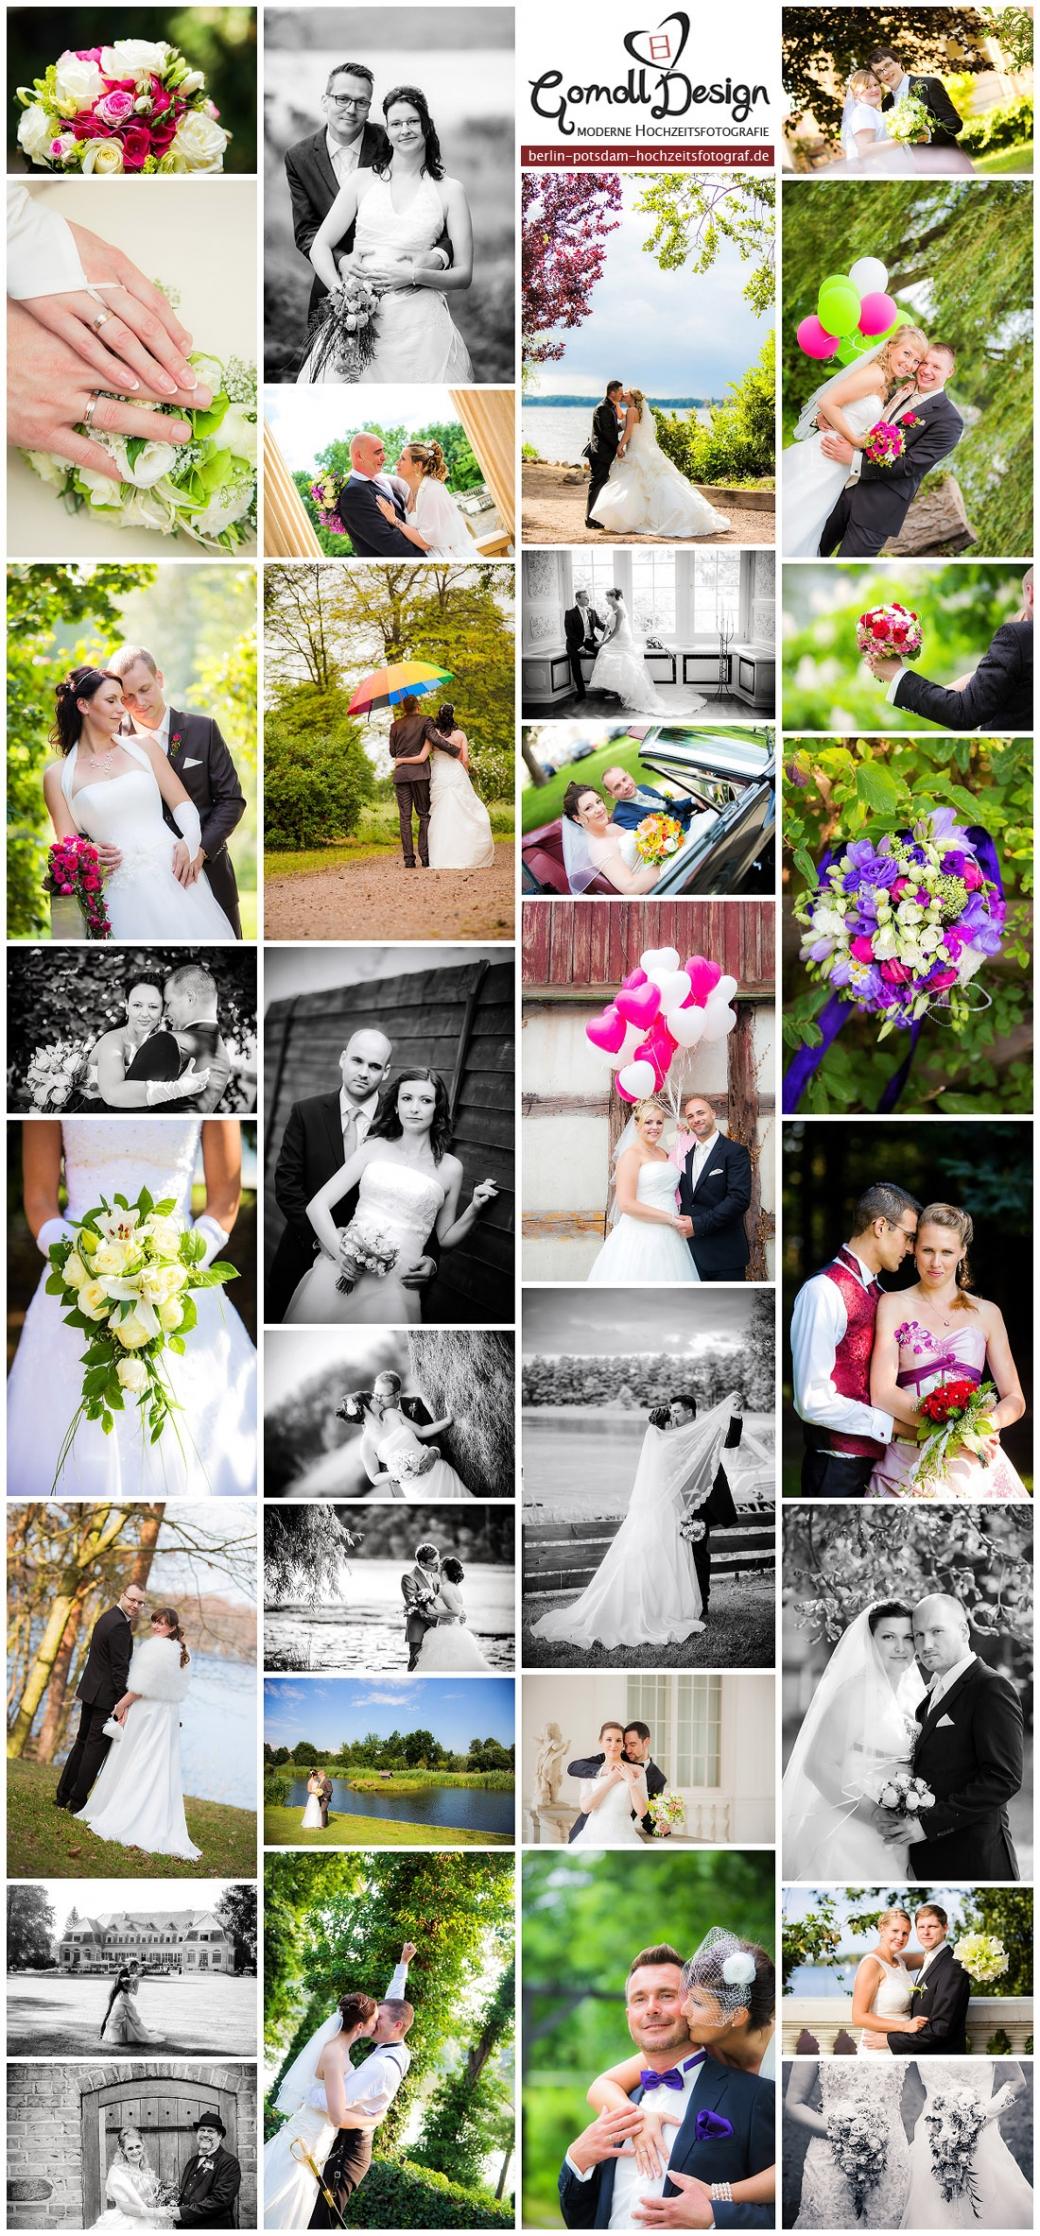 GomollDesign Andrea Gomoll Hochzeitsfotografie 2014